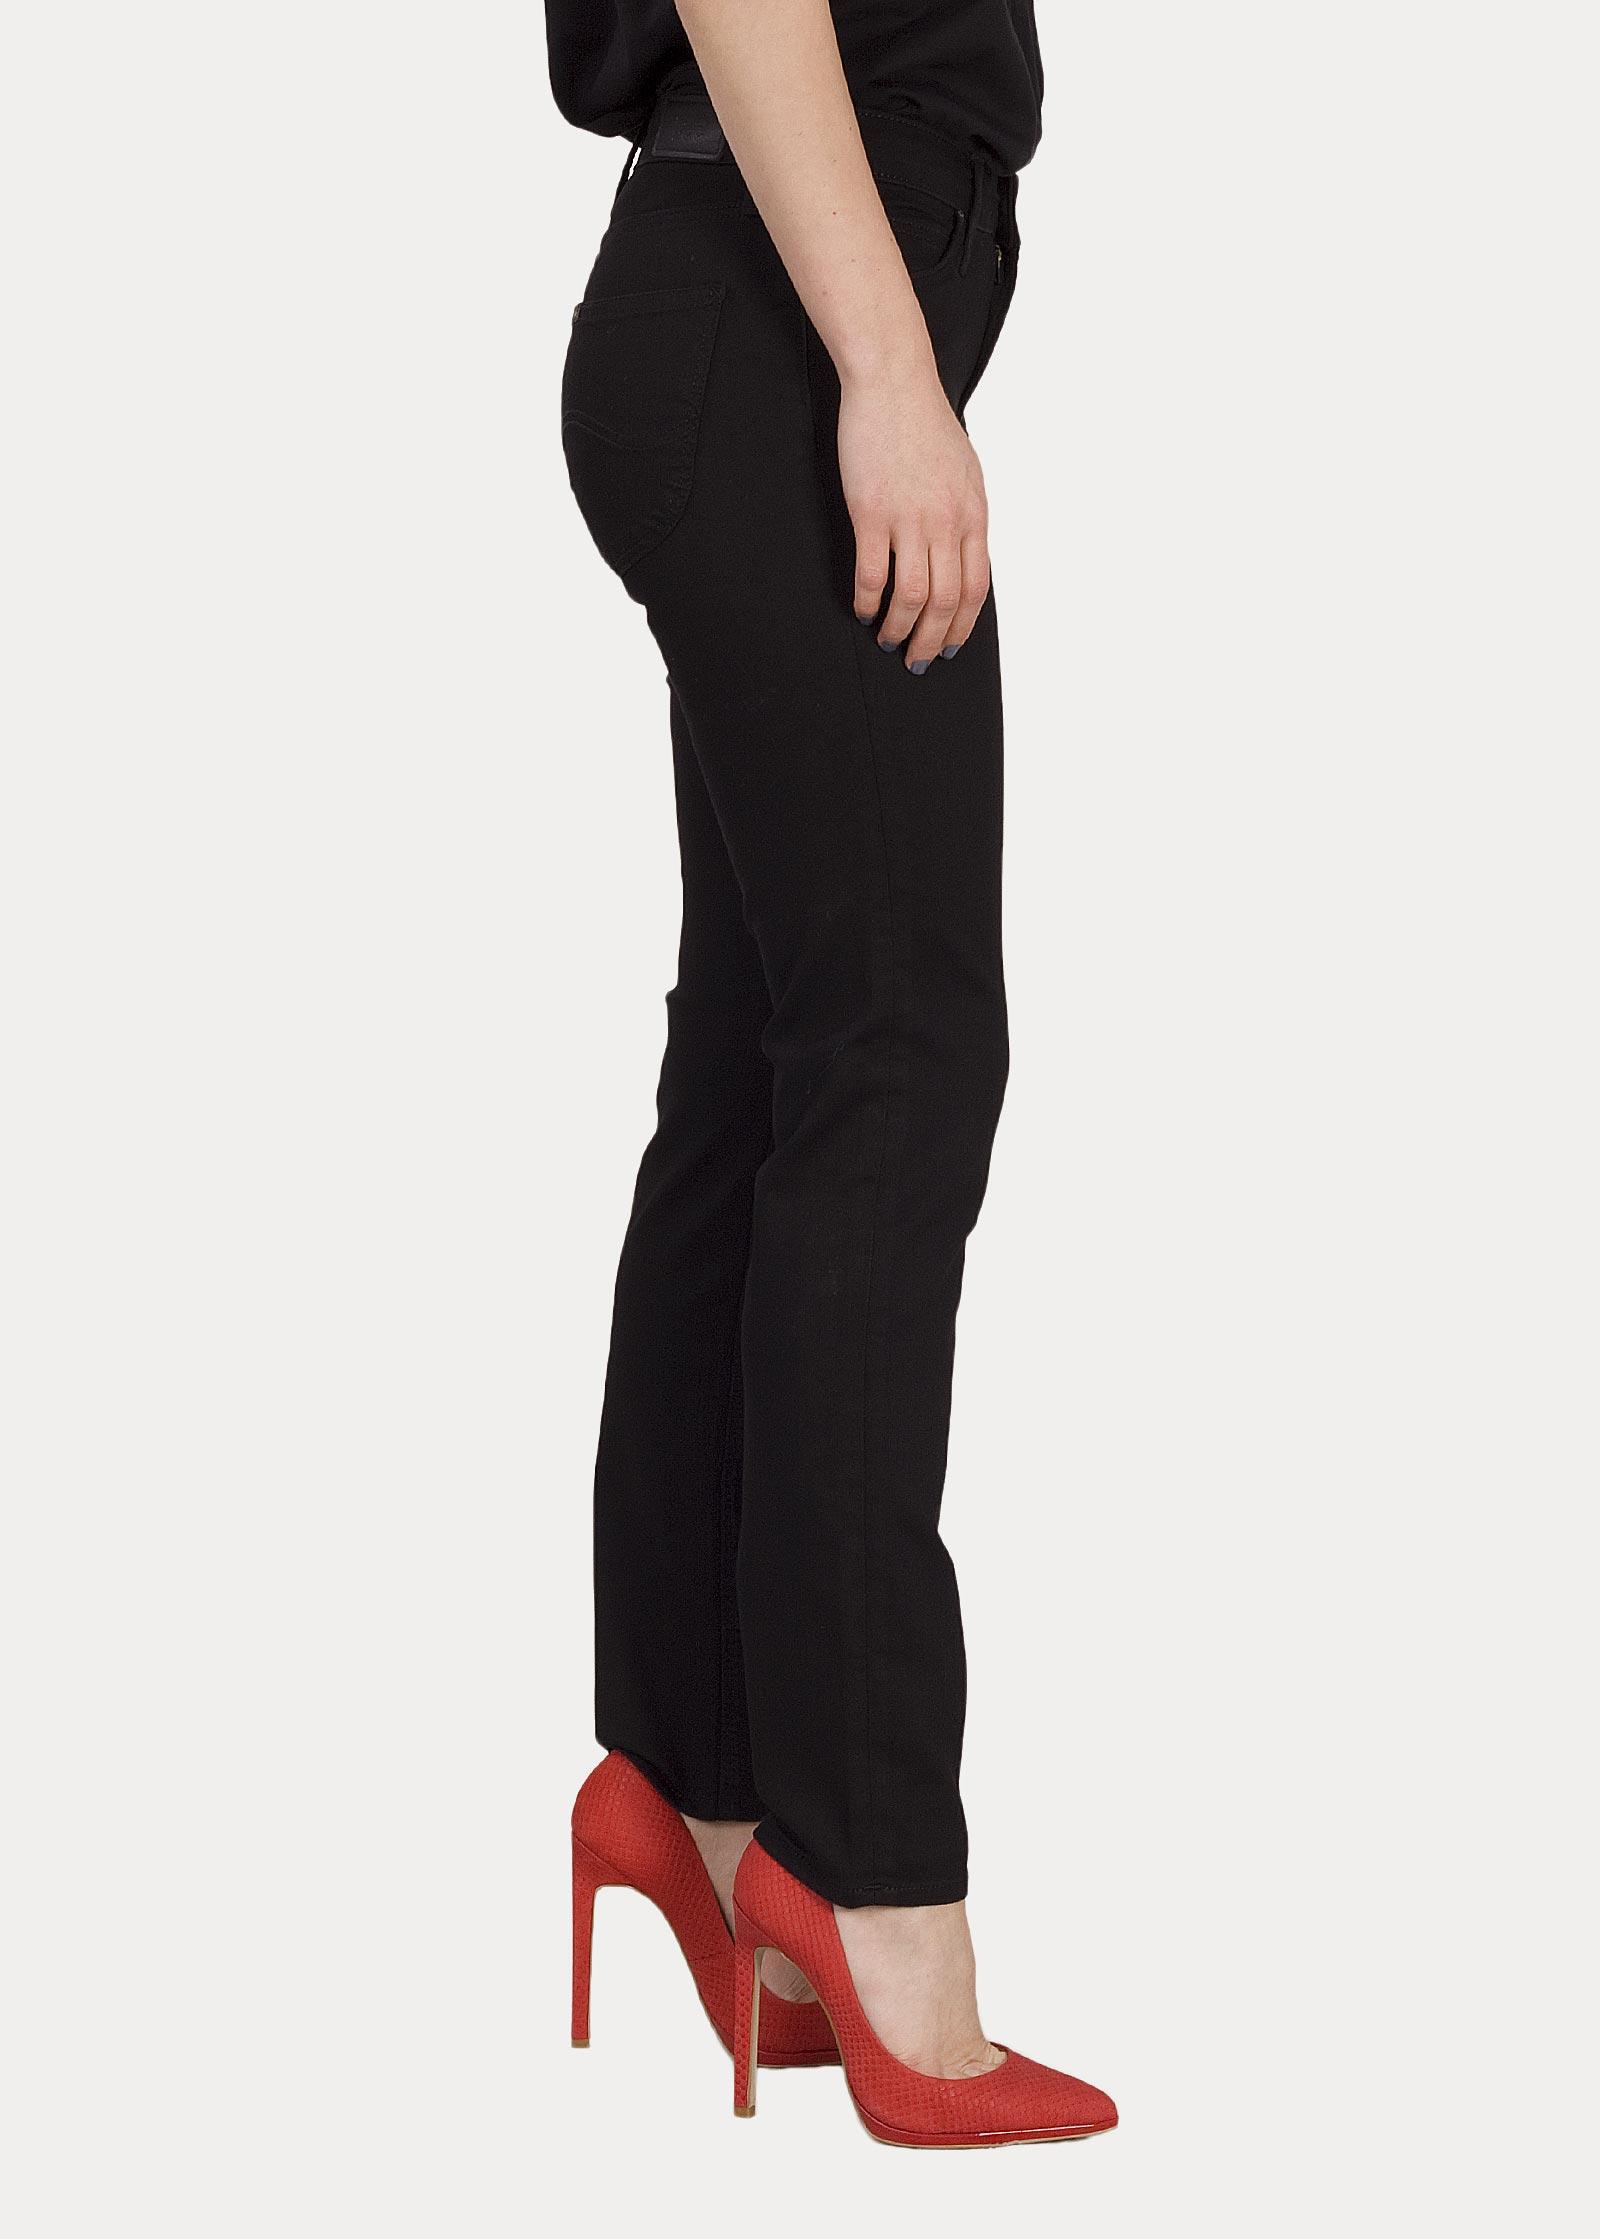 fcb692f4cc Damskie Spodnie Lee® Elly - Black Rinse (L305FS47) - Jeans24h.pl